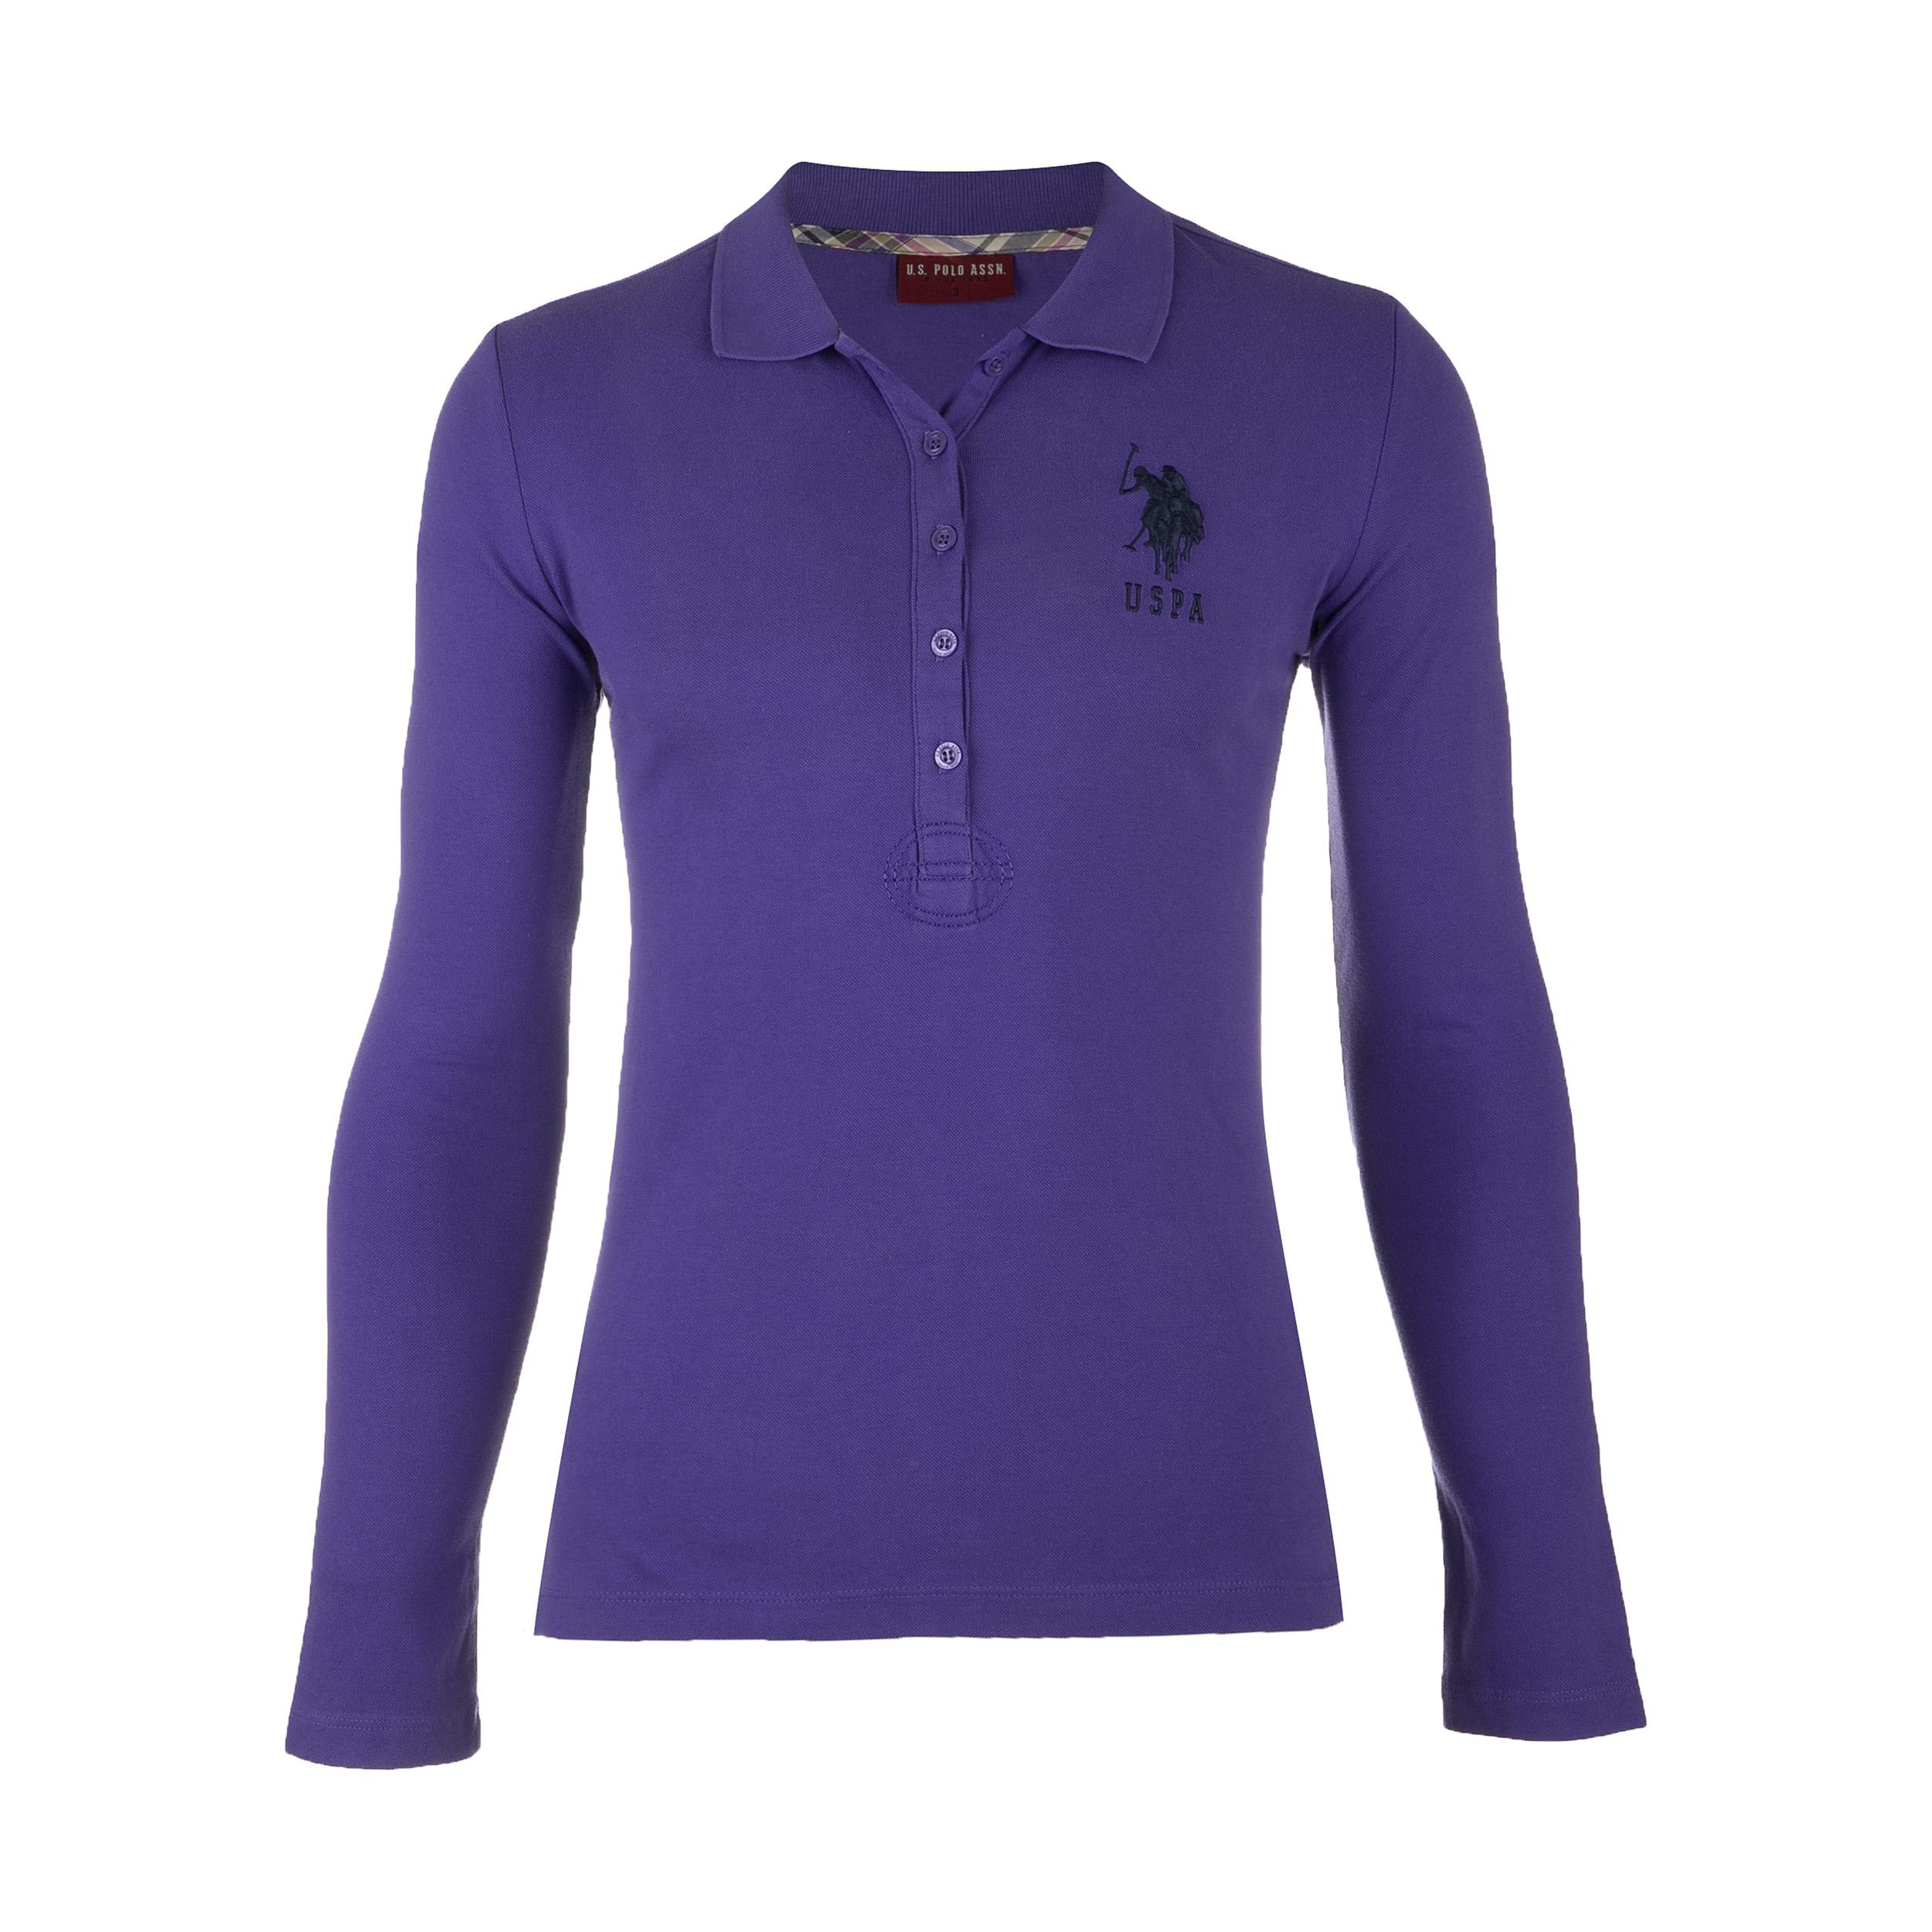 خرید پولو شرت آستین بلند زنانه یو اس پولو مدل 082308